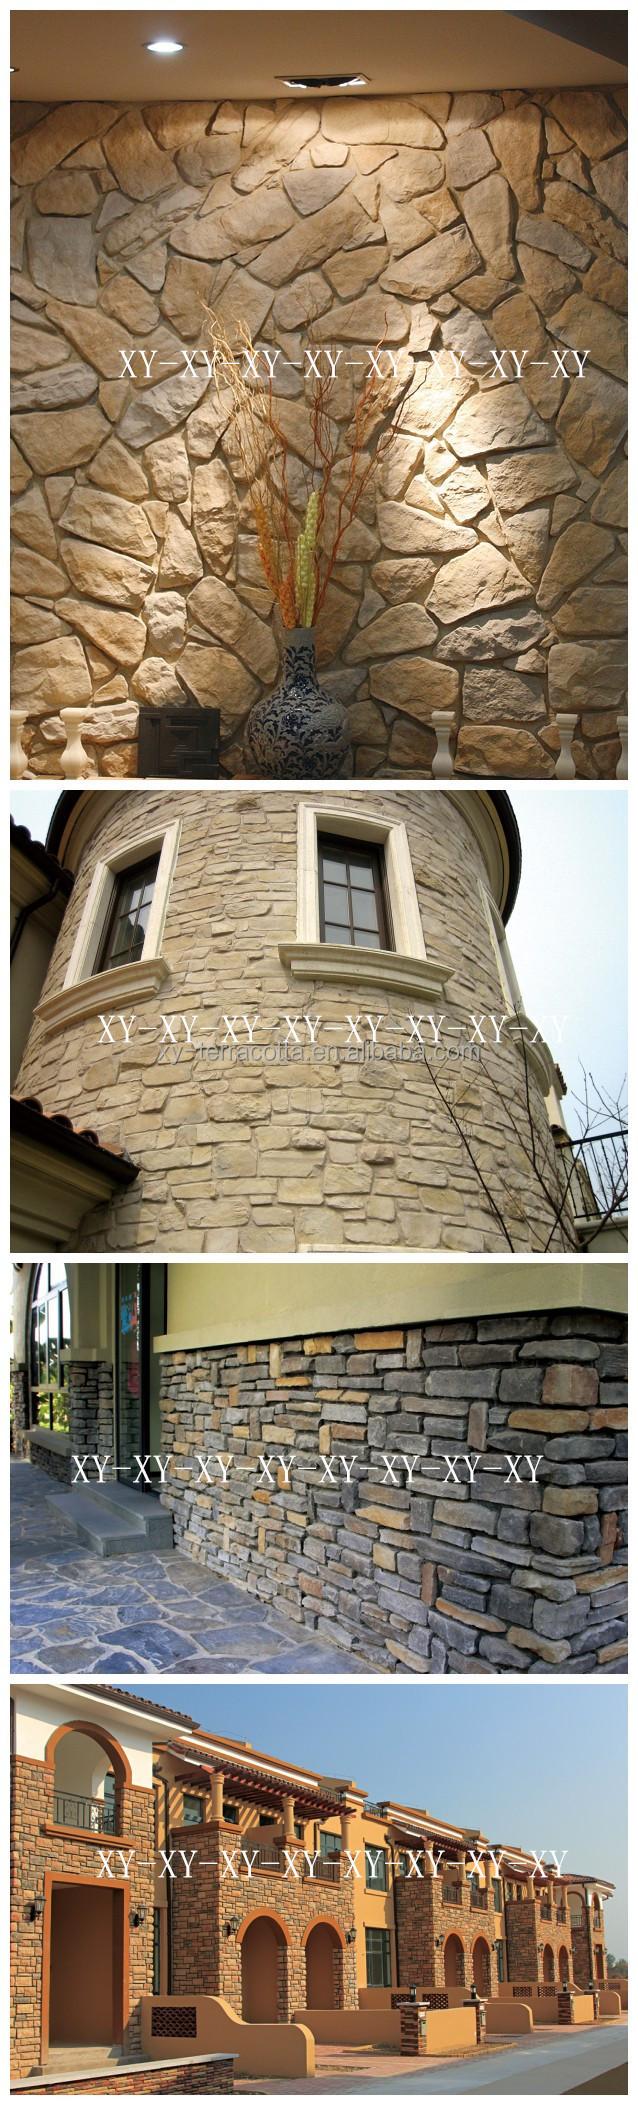 Exterieur interieur stenen muur bekleding ontwerp kunstmatige ...